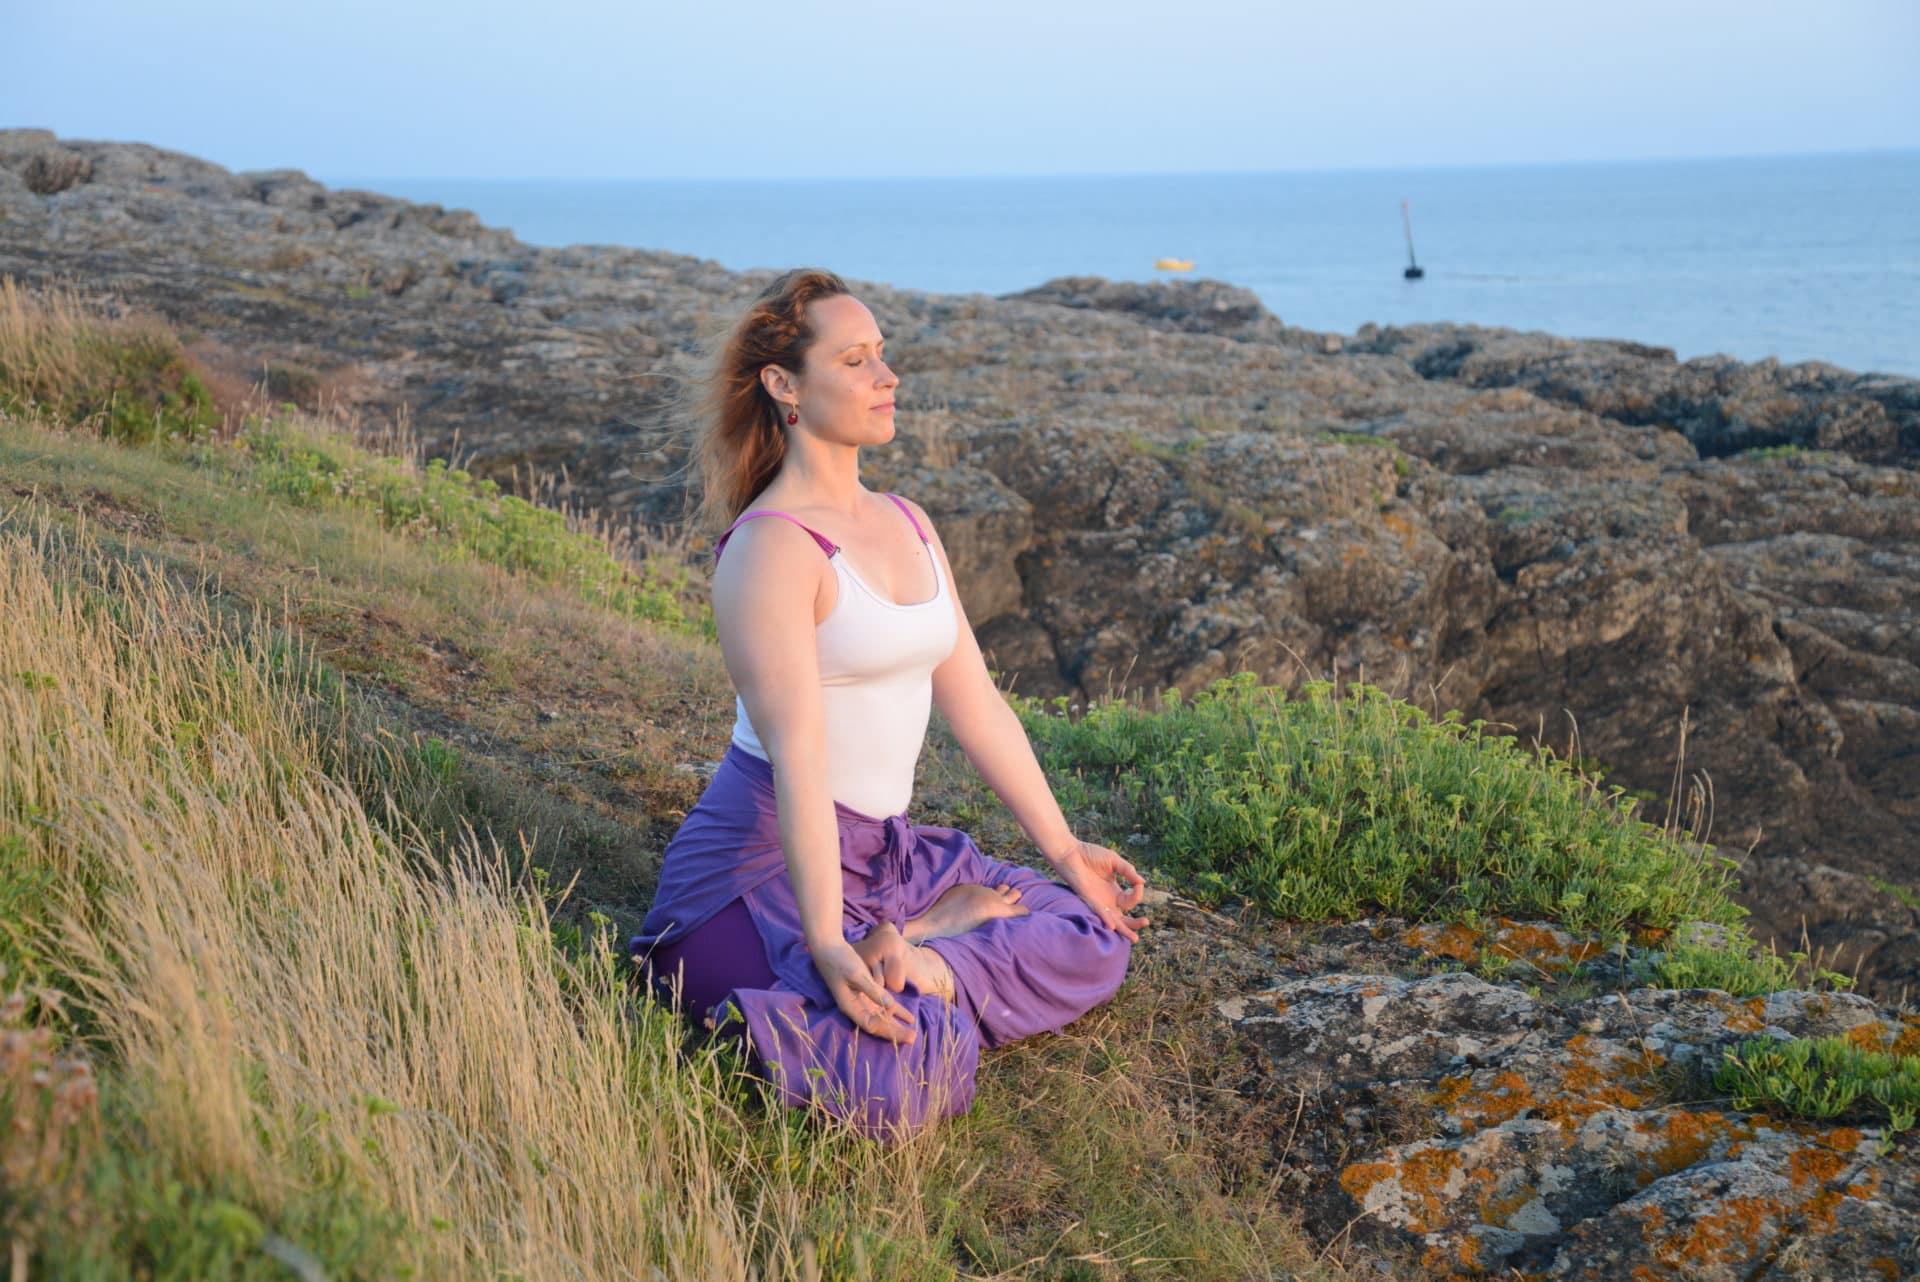 Le pranayama, un pilier fondamental du yoga